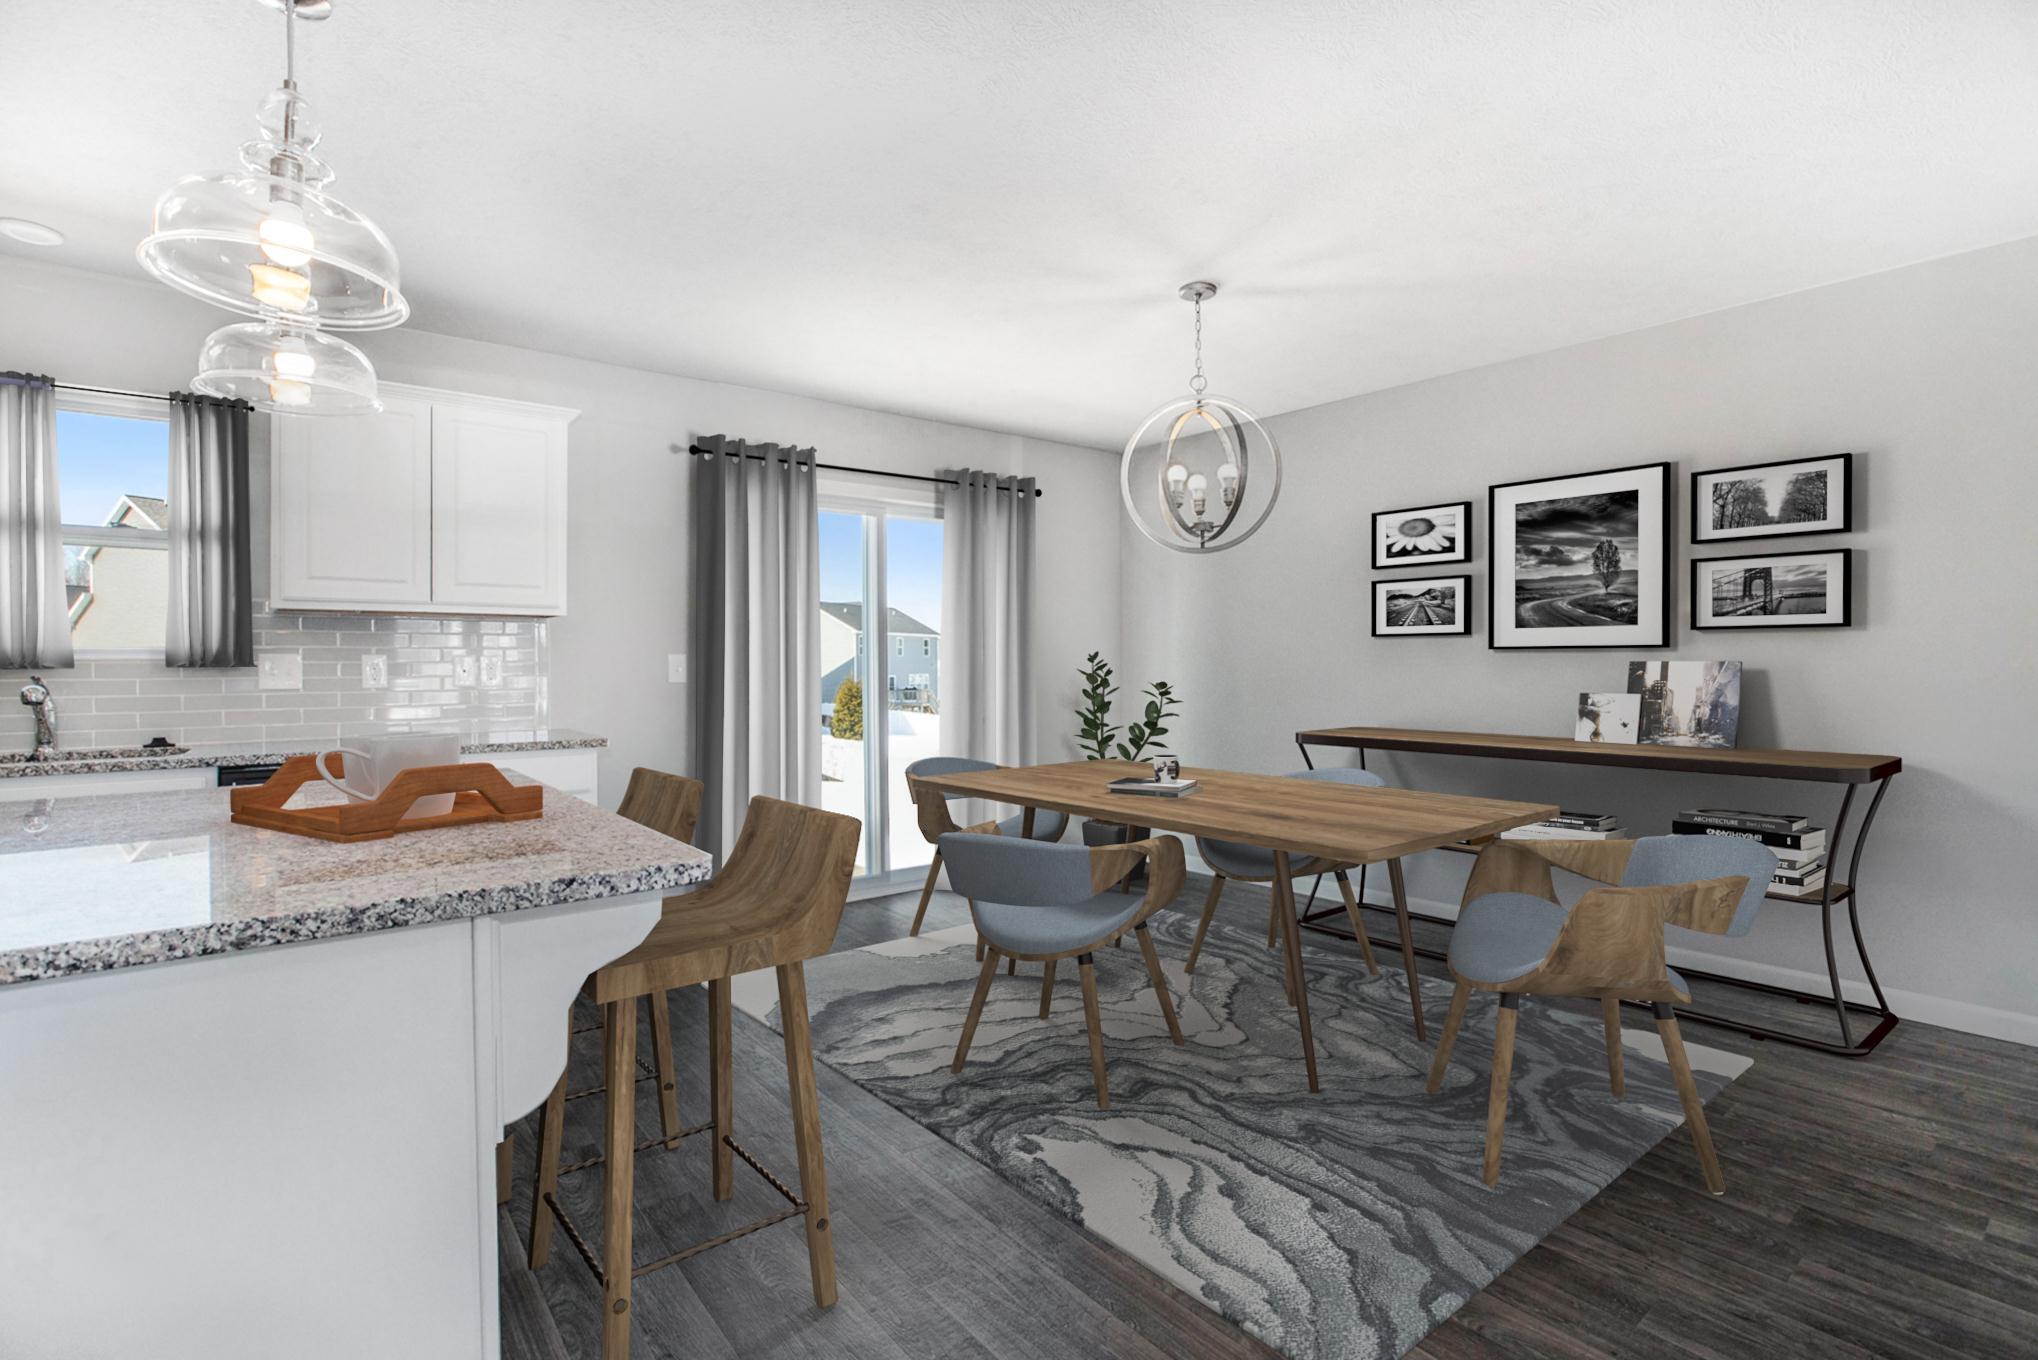 Kitchen featured in the Elements 1800 By Allen Edwin Homes in Benton Harbor, MI